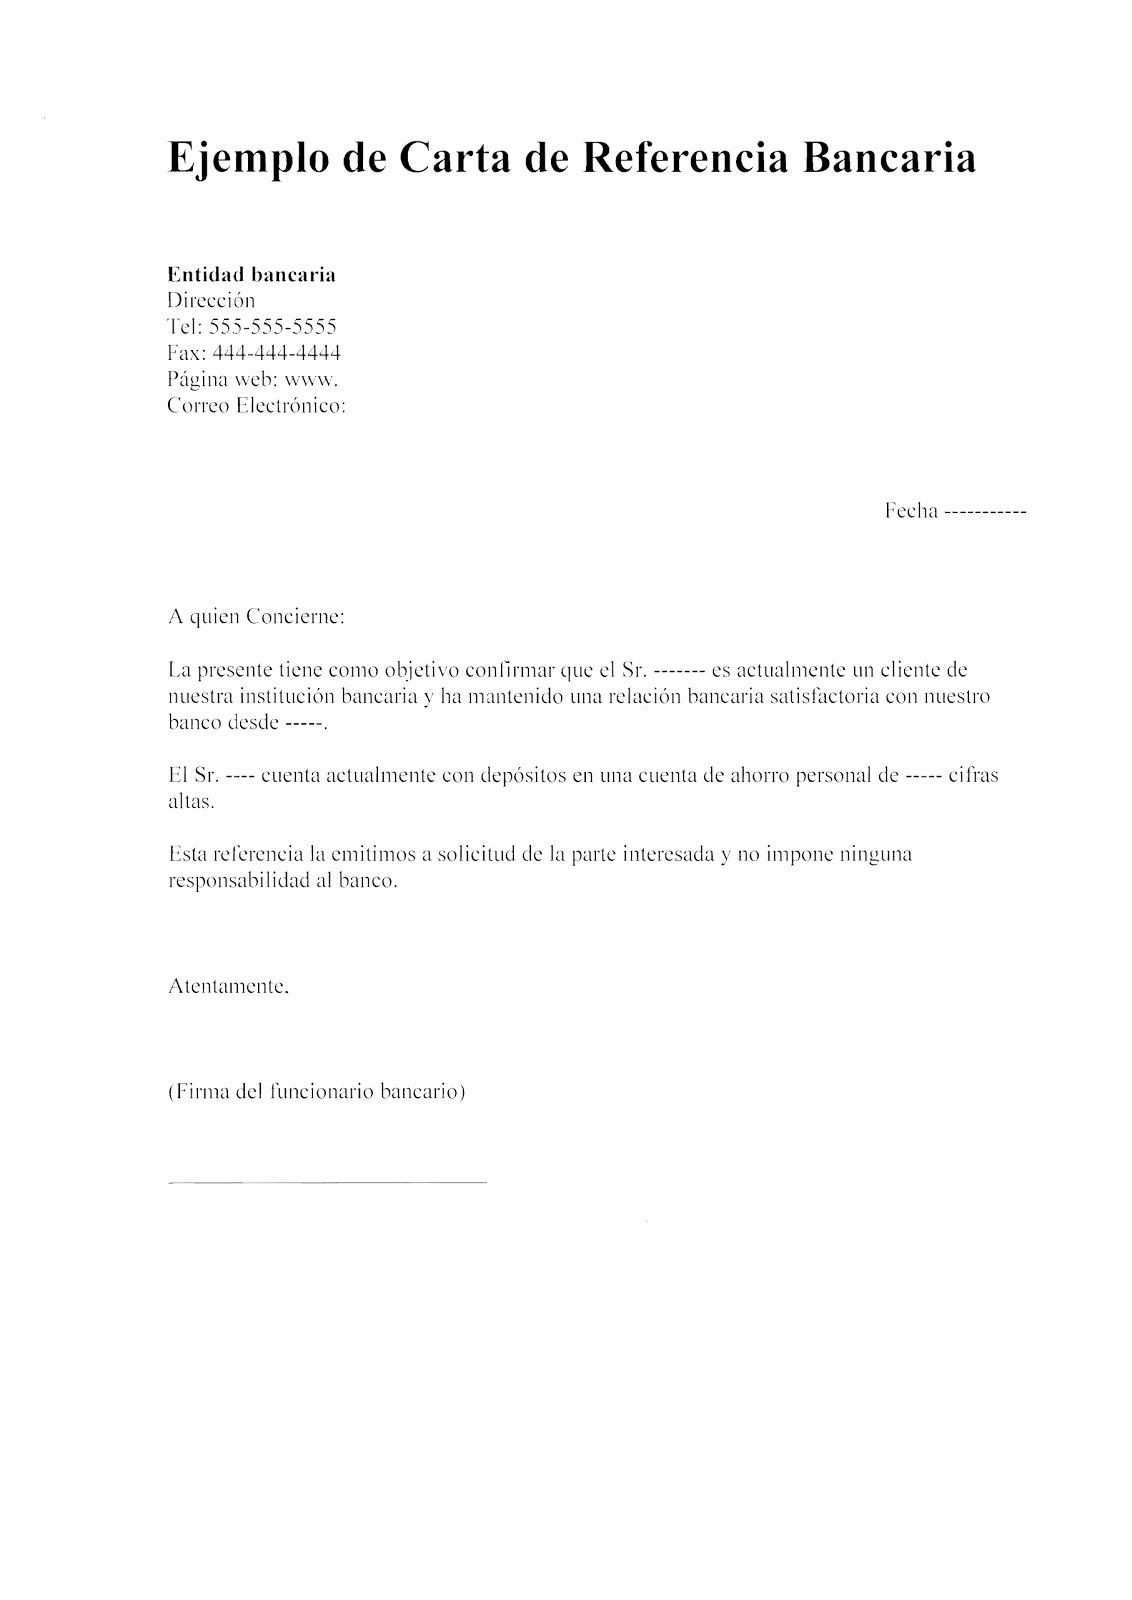 Modelos De Carta De Recomendacion Inspirational Modelo Carta De Re Endacion Imagui